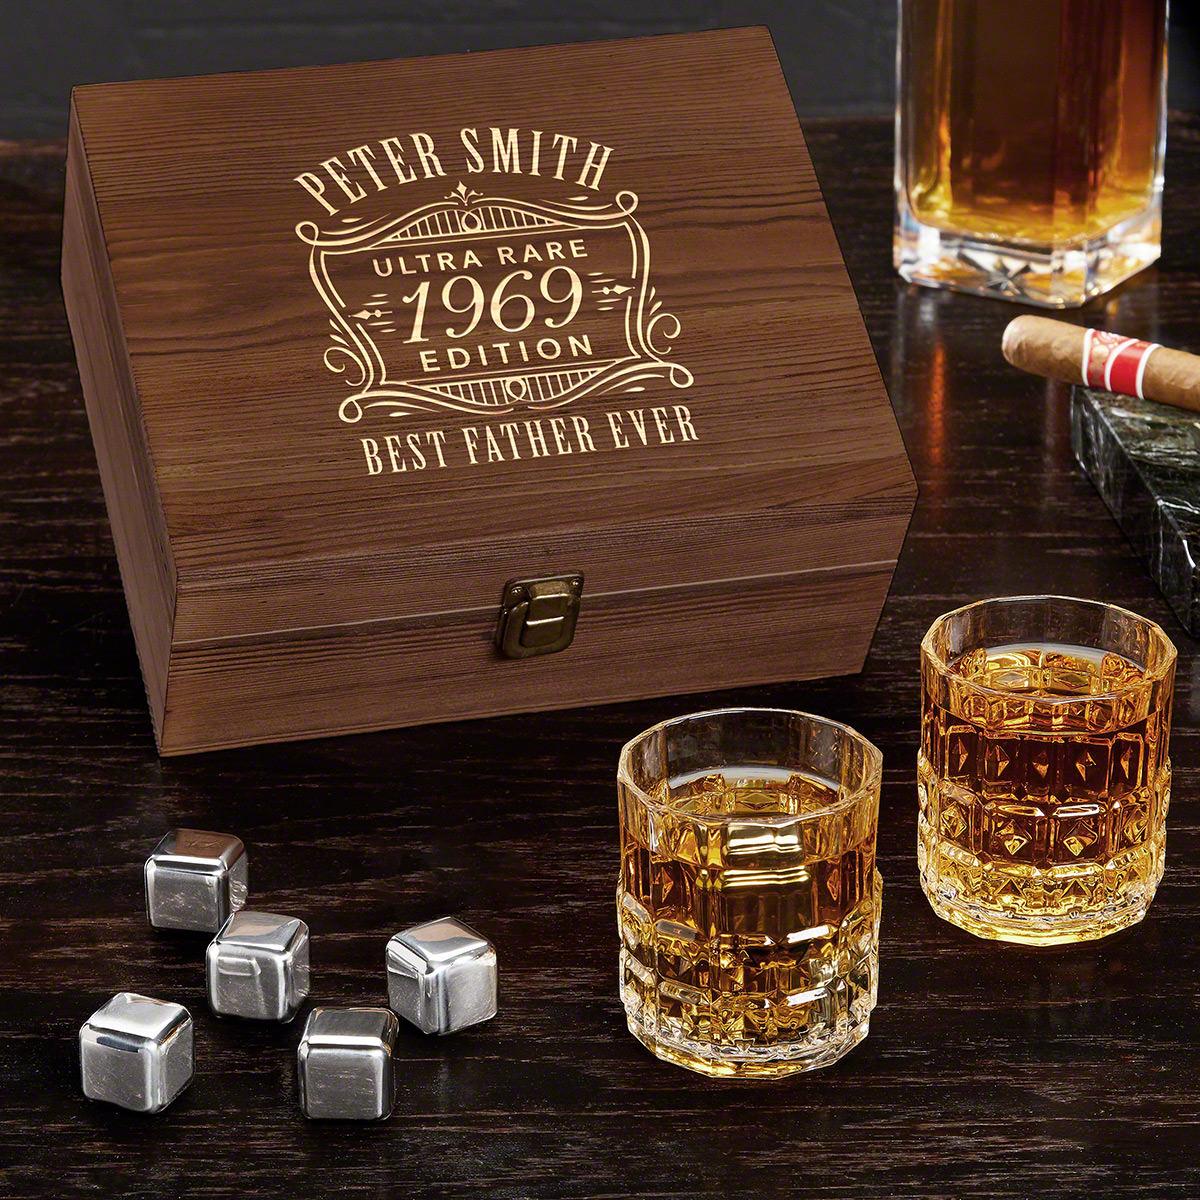 Ultra Rare Edition Personalized Whiskey Box Set